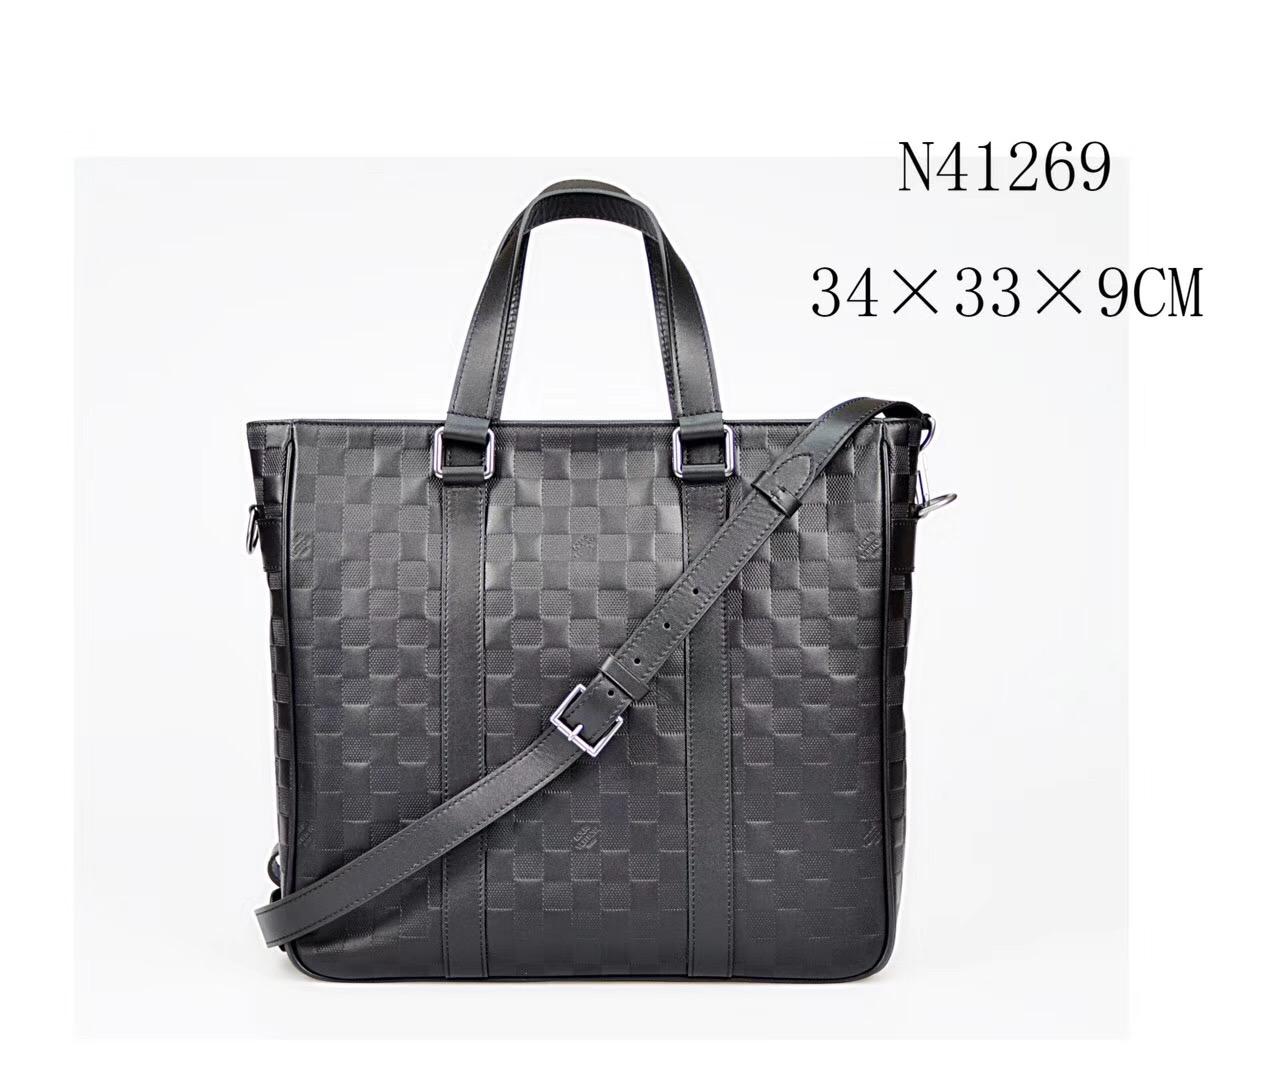 dad97c1b8844 Men LV Louis Vuitton Damier Tote Leather Handbags N41269 bags Black ...